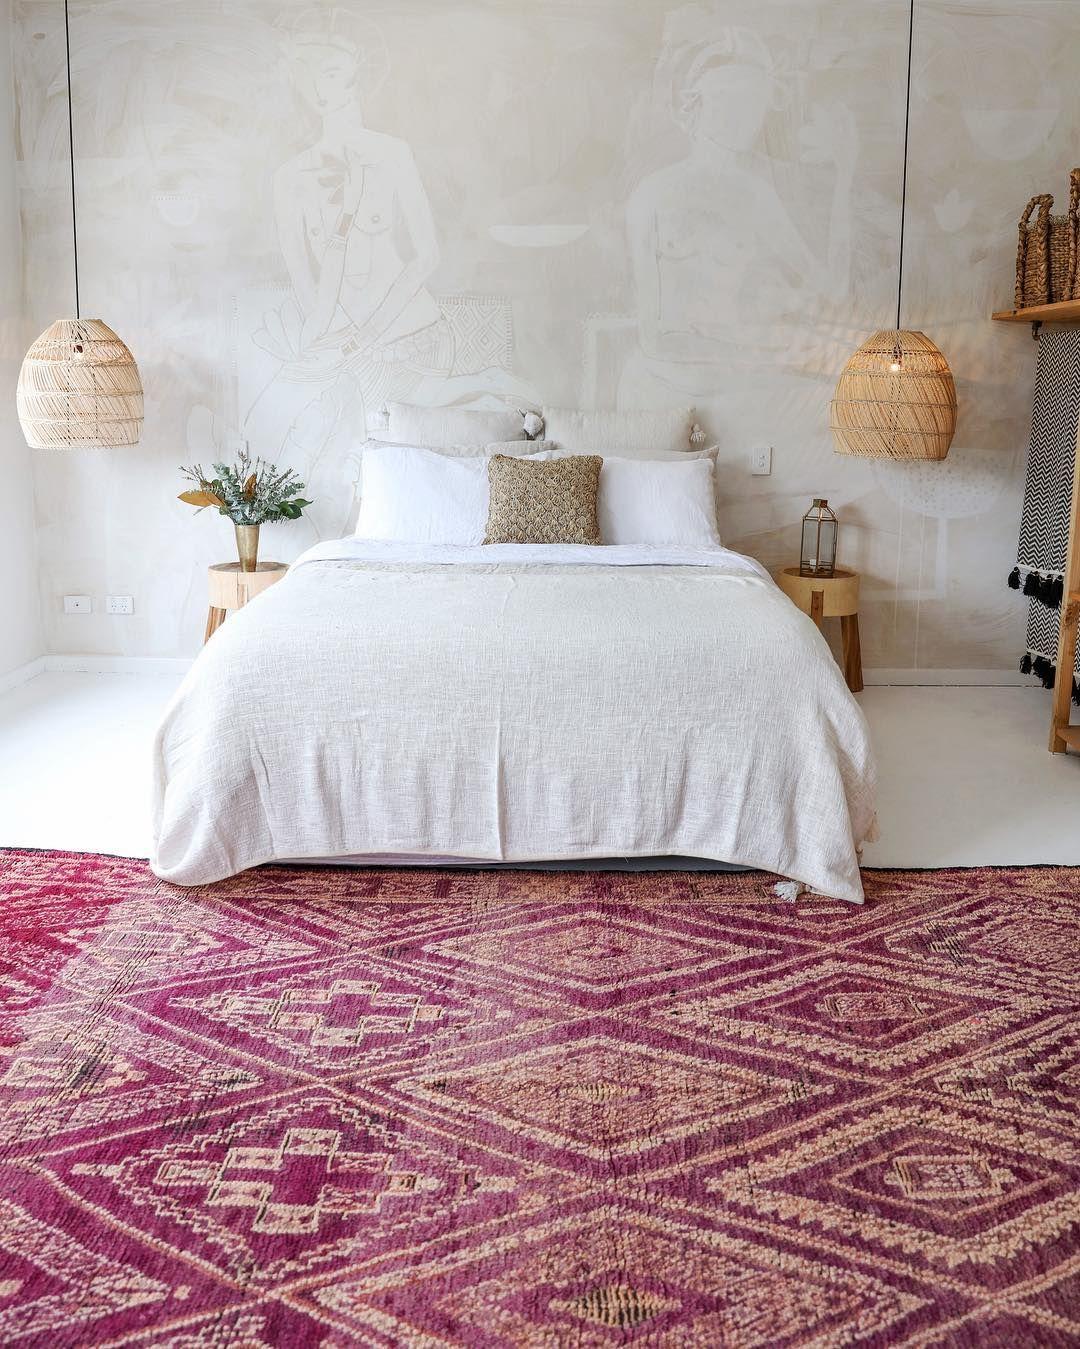 Interior-Trend: Boho-Deko | BOHO TREND | Mustard bedroom ...